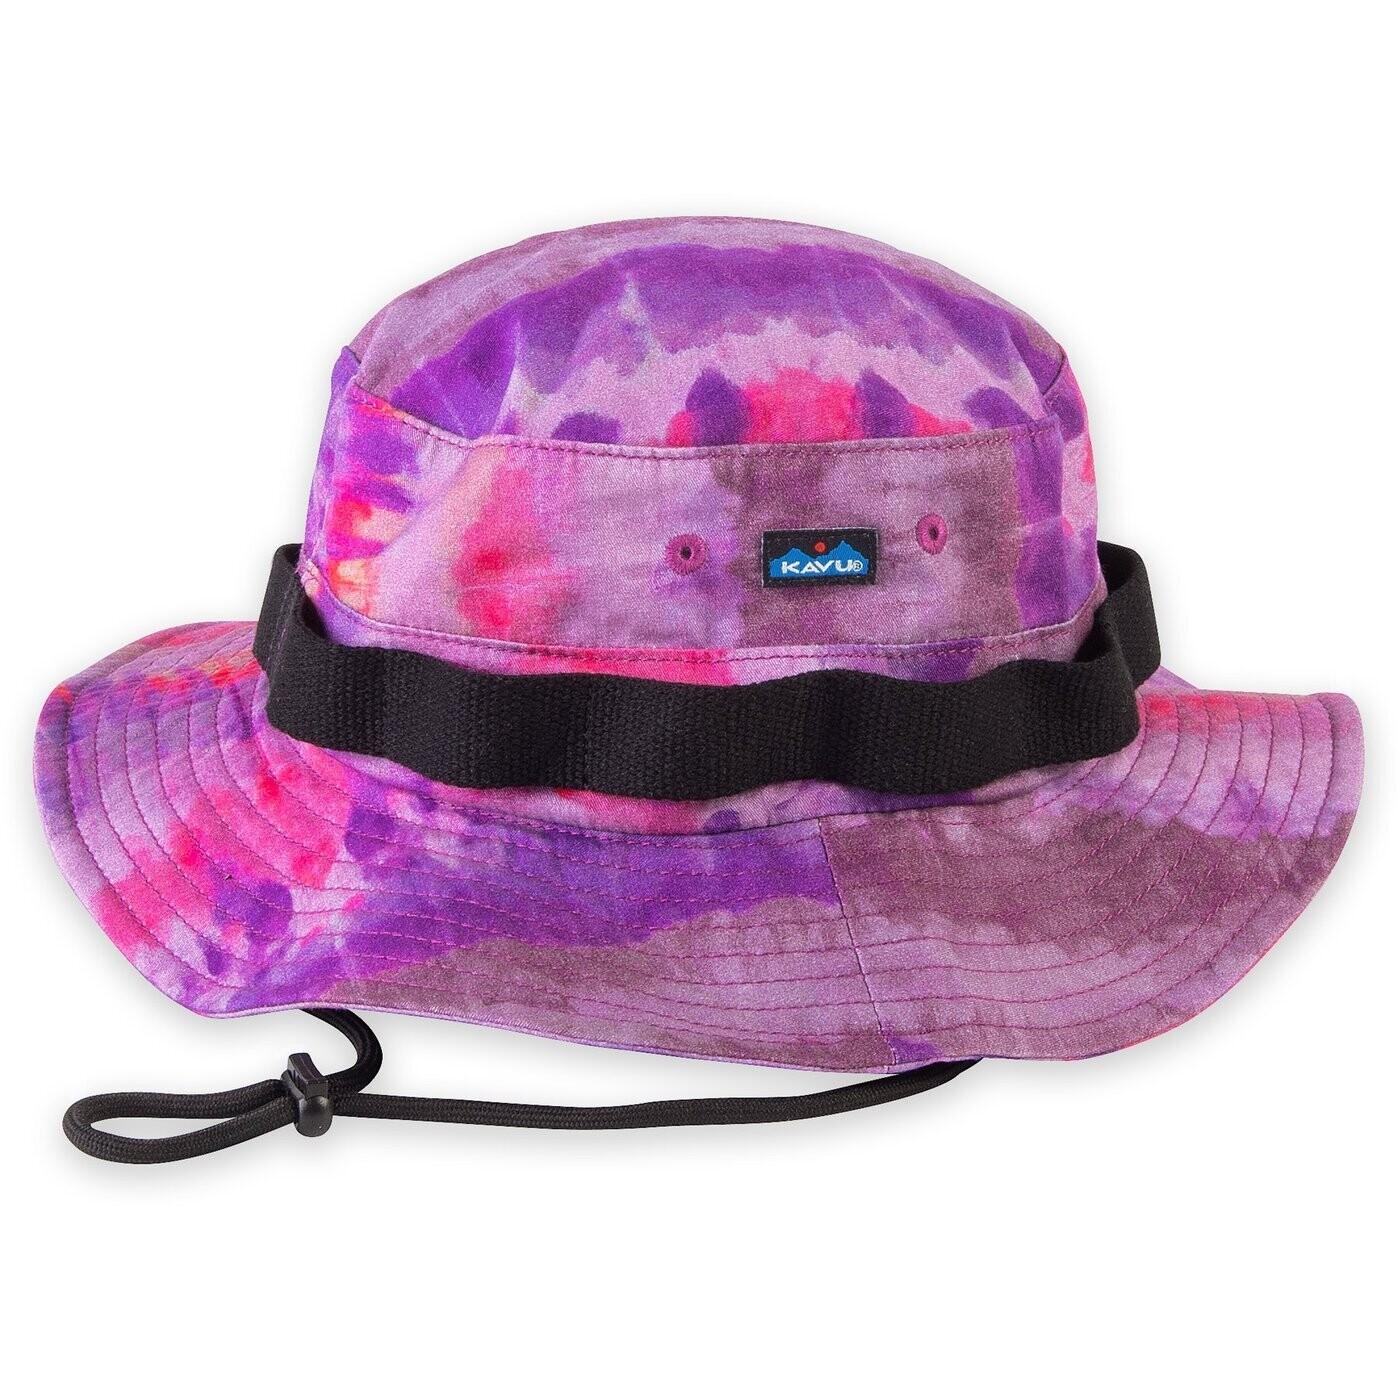 KAVU Onshore Rad Tye Dye Bucket Hat